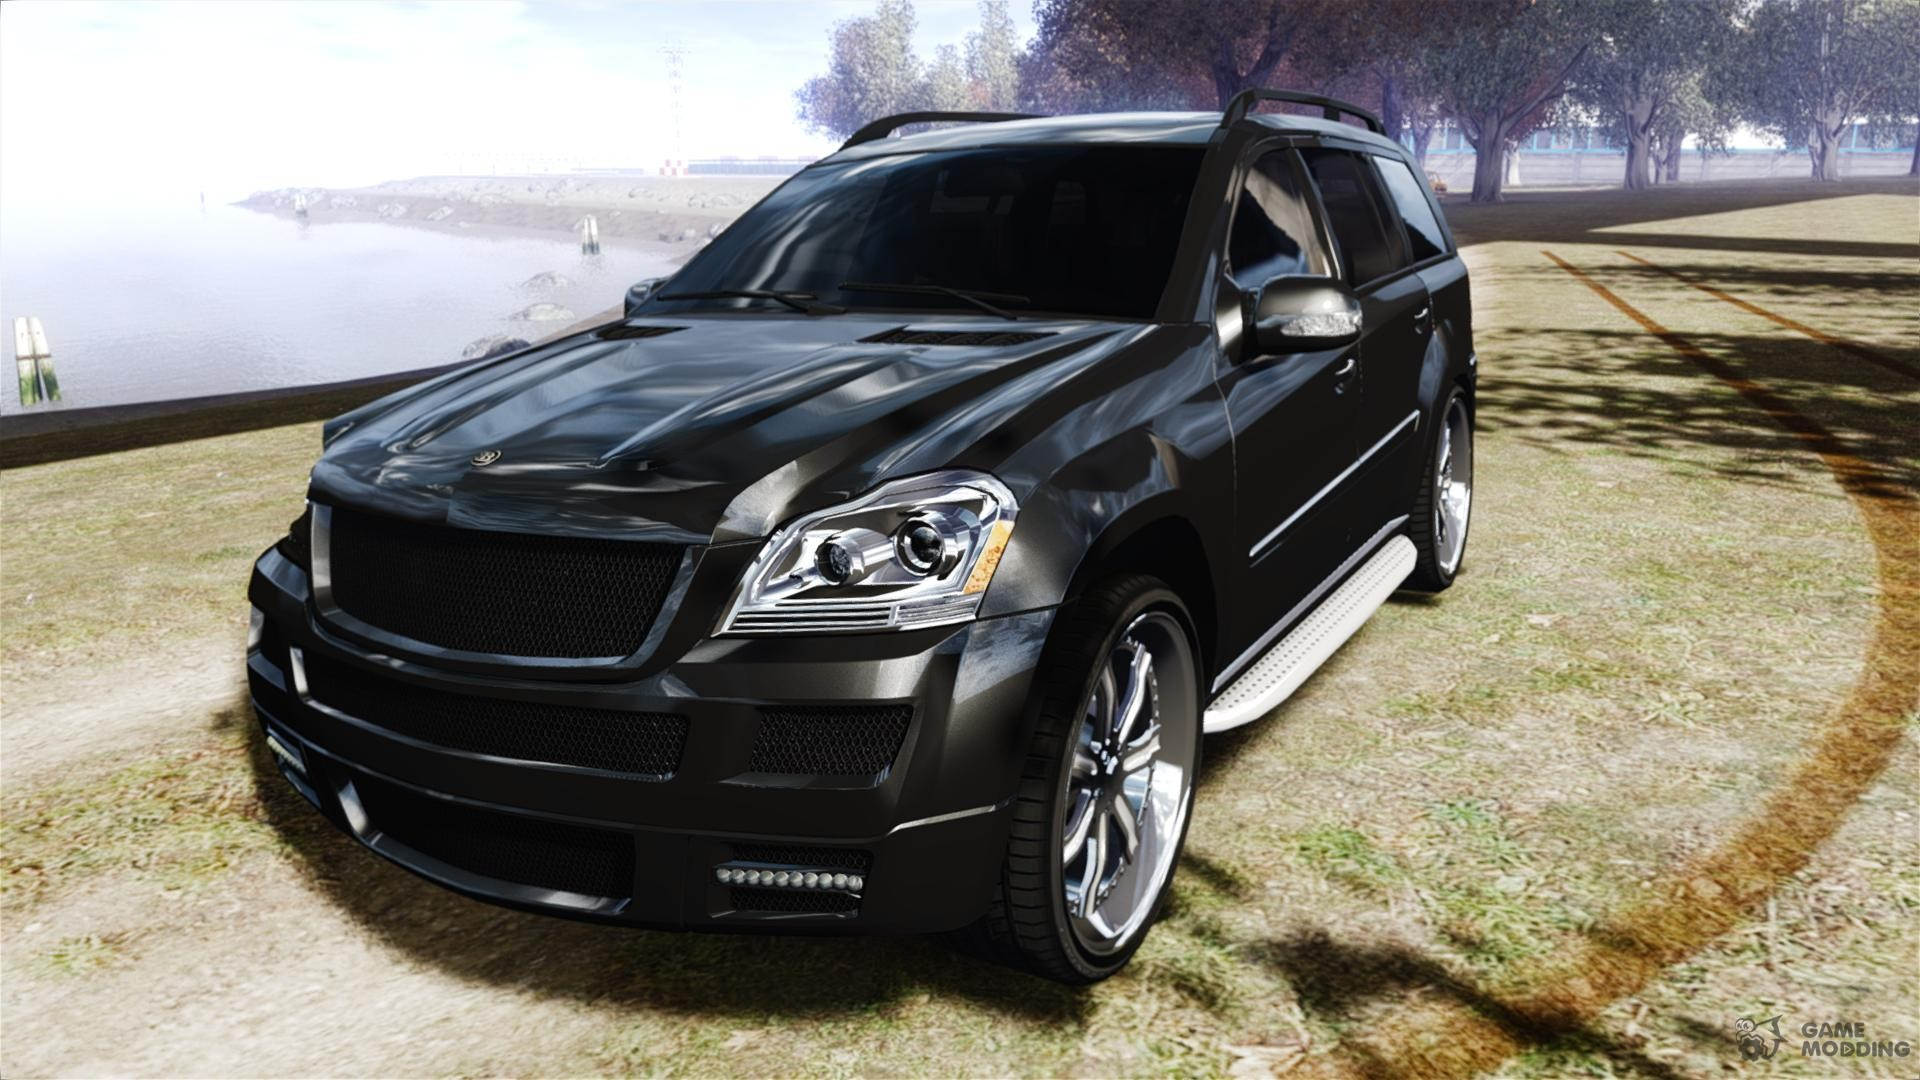 Mercedes benz gl450 brabus black edition for gta 4 for Mercedes benz ml 450